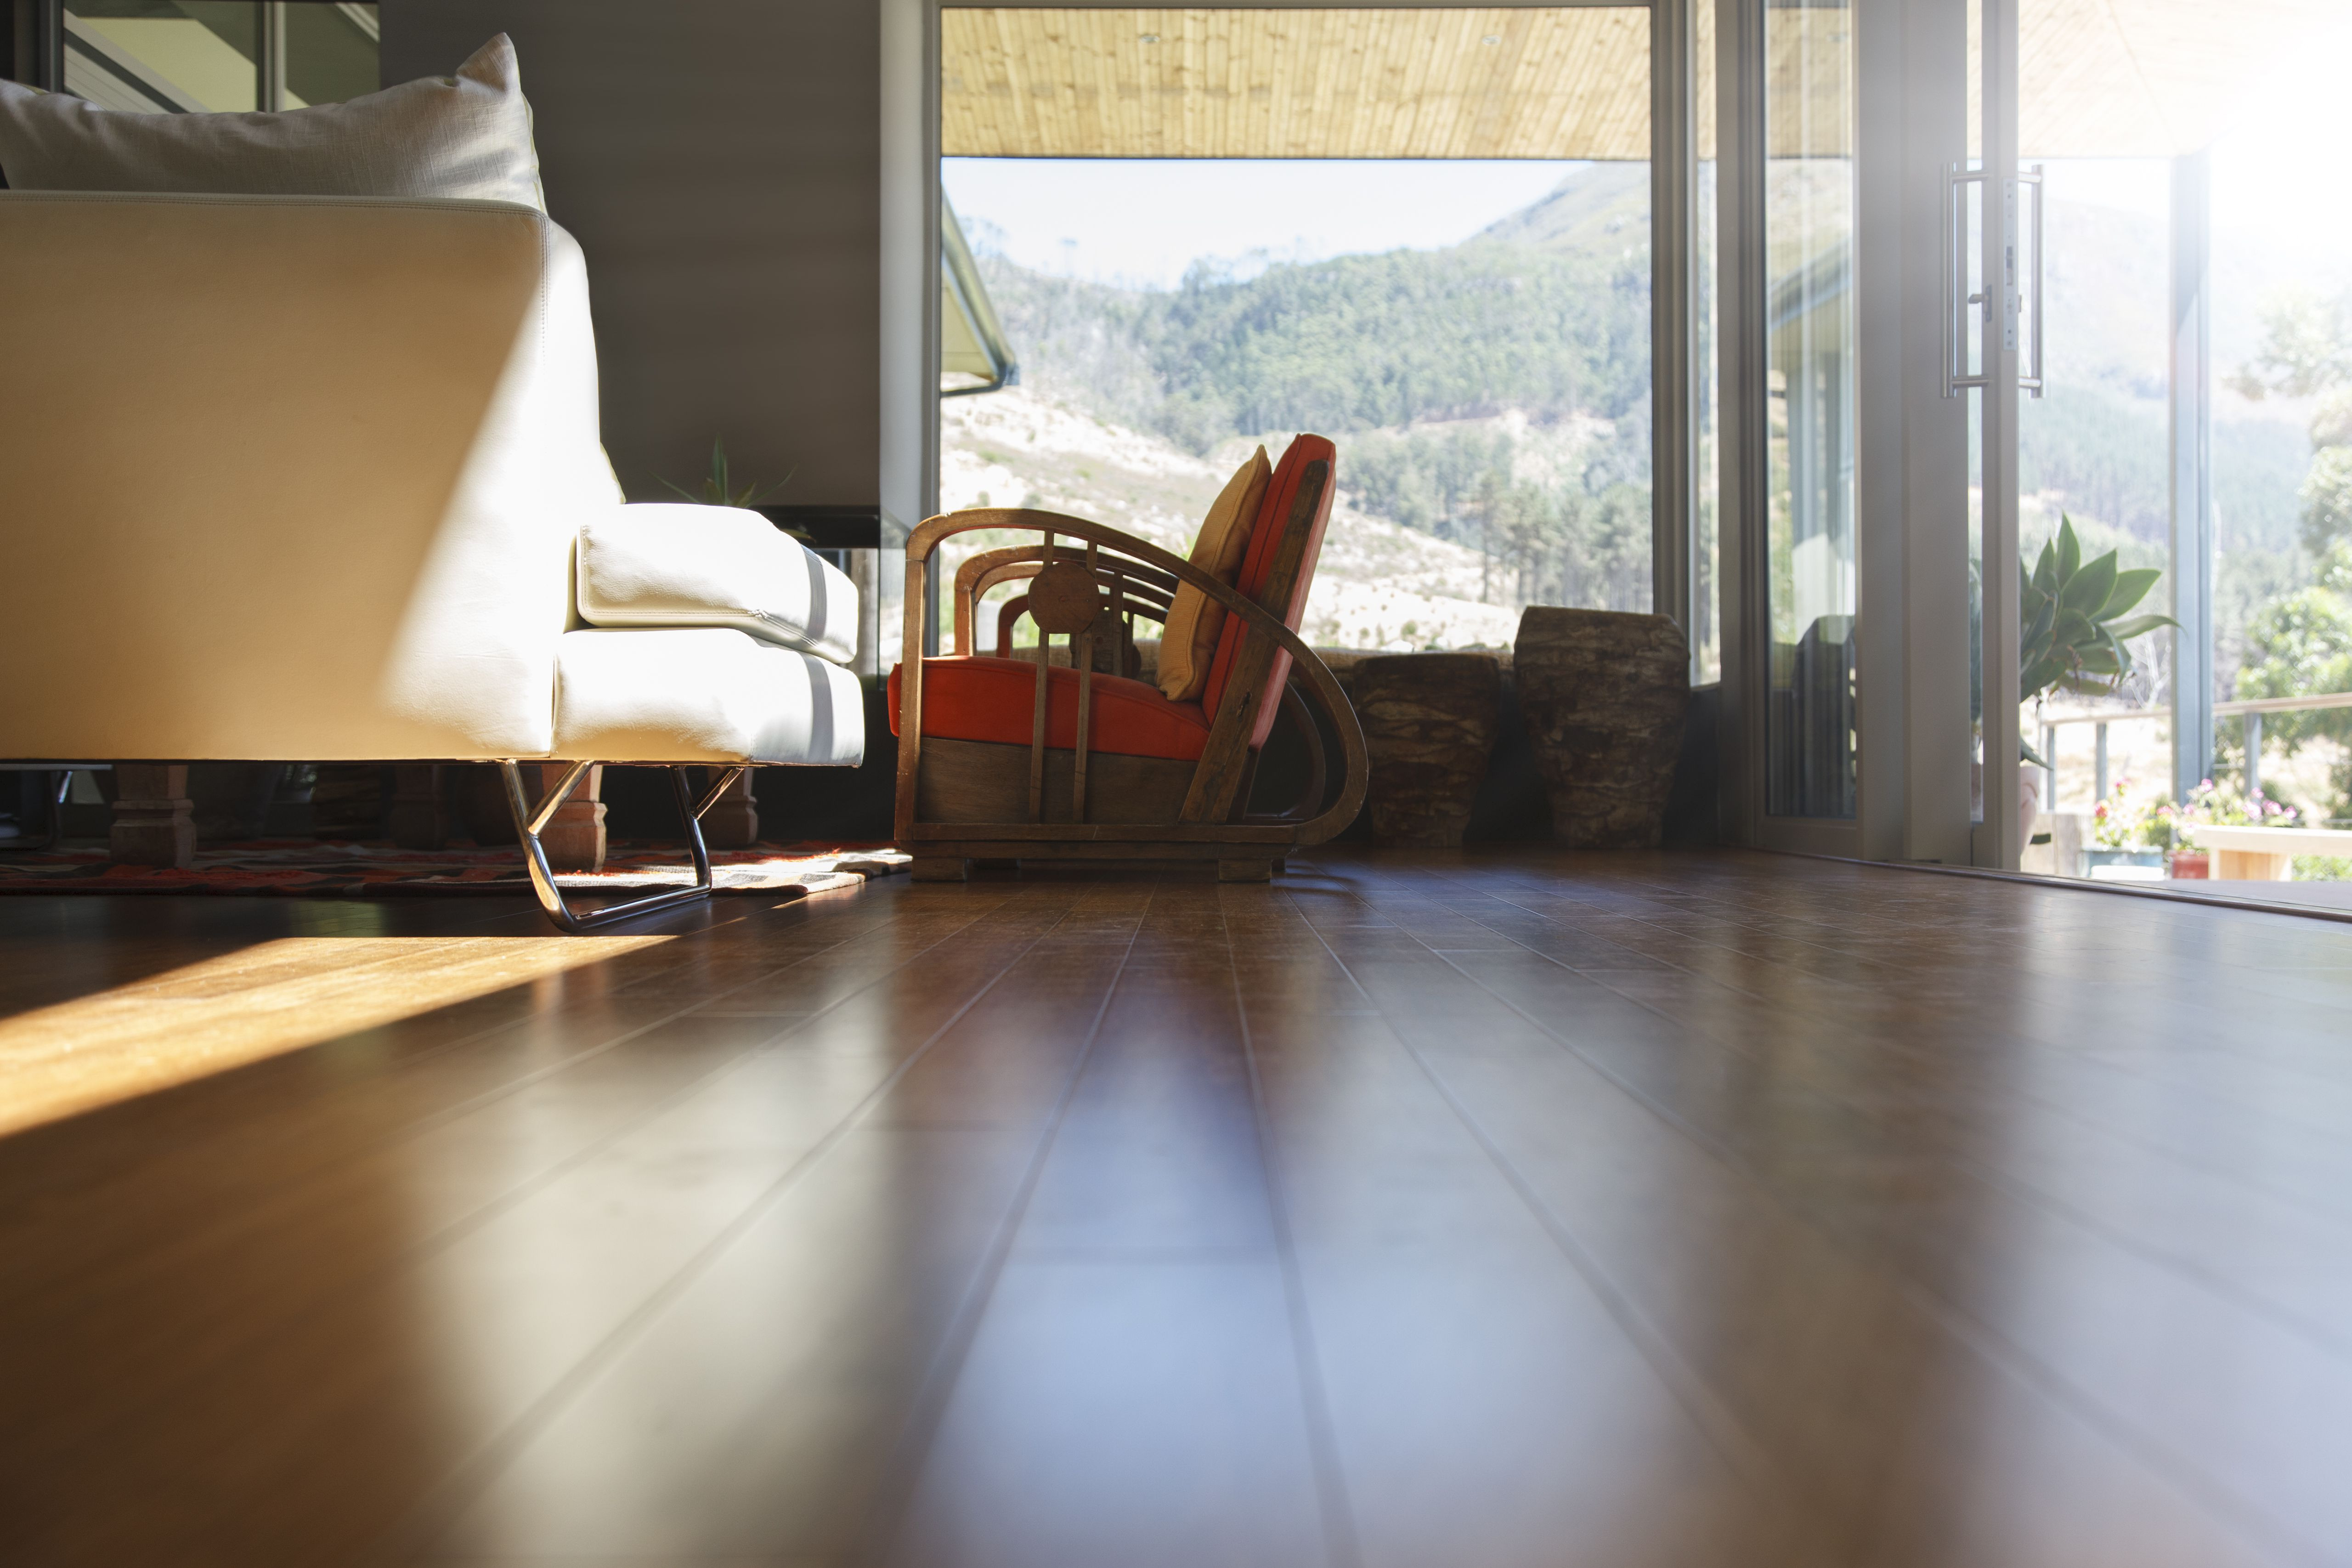 15 Amazing 5 Hand Scraped Hardwood Flooring 2021 free download 5 hand scraped hardwood flooring of types of engineered flooring from premium hardwoods intended for living room interior hard wood floor and sofa 525439899 5a764f241d64040037603c15